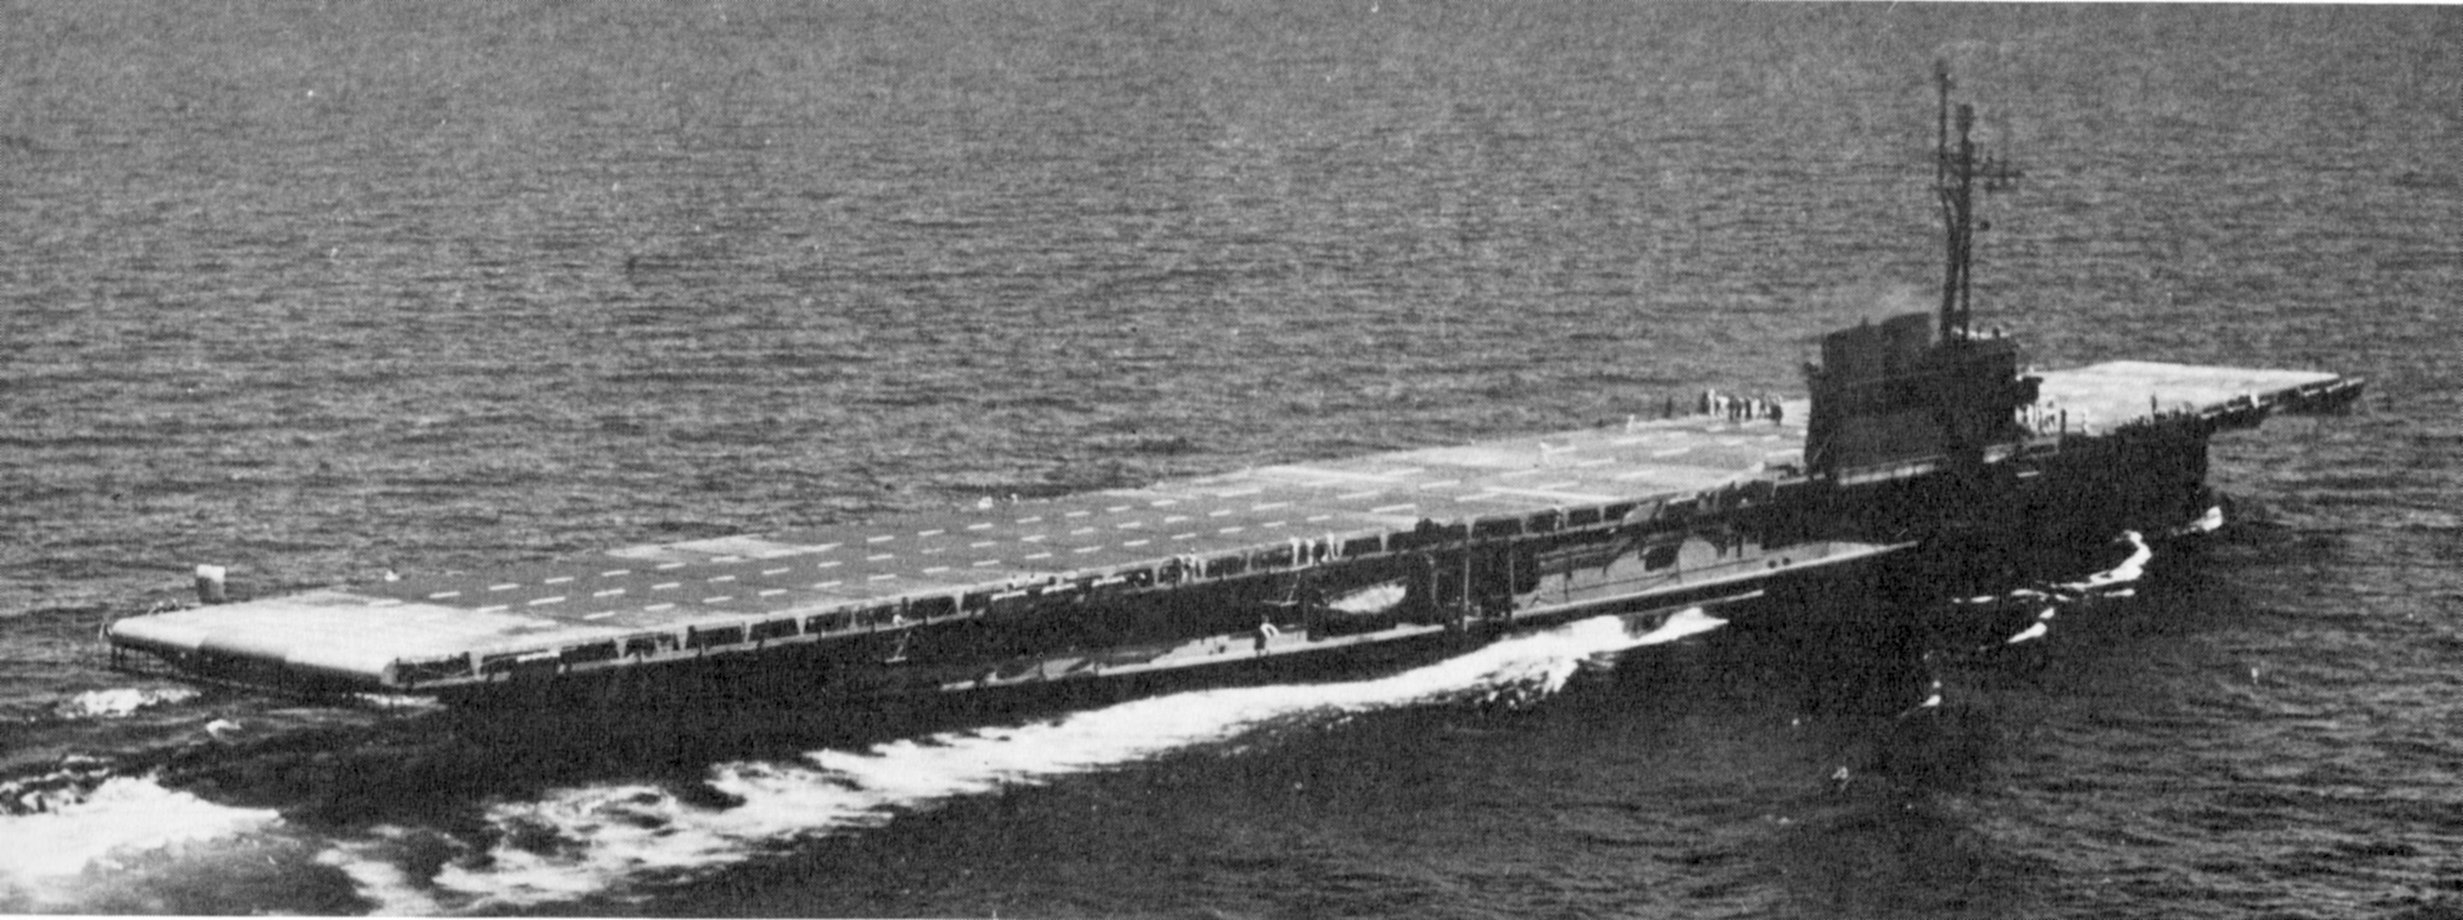 aircraft carrier diagram cool paper plane miscellaneous photo index